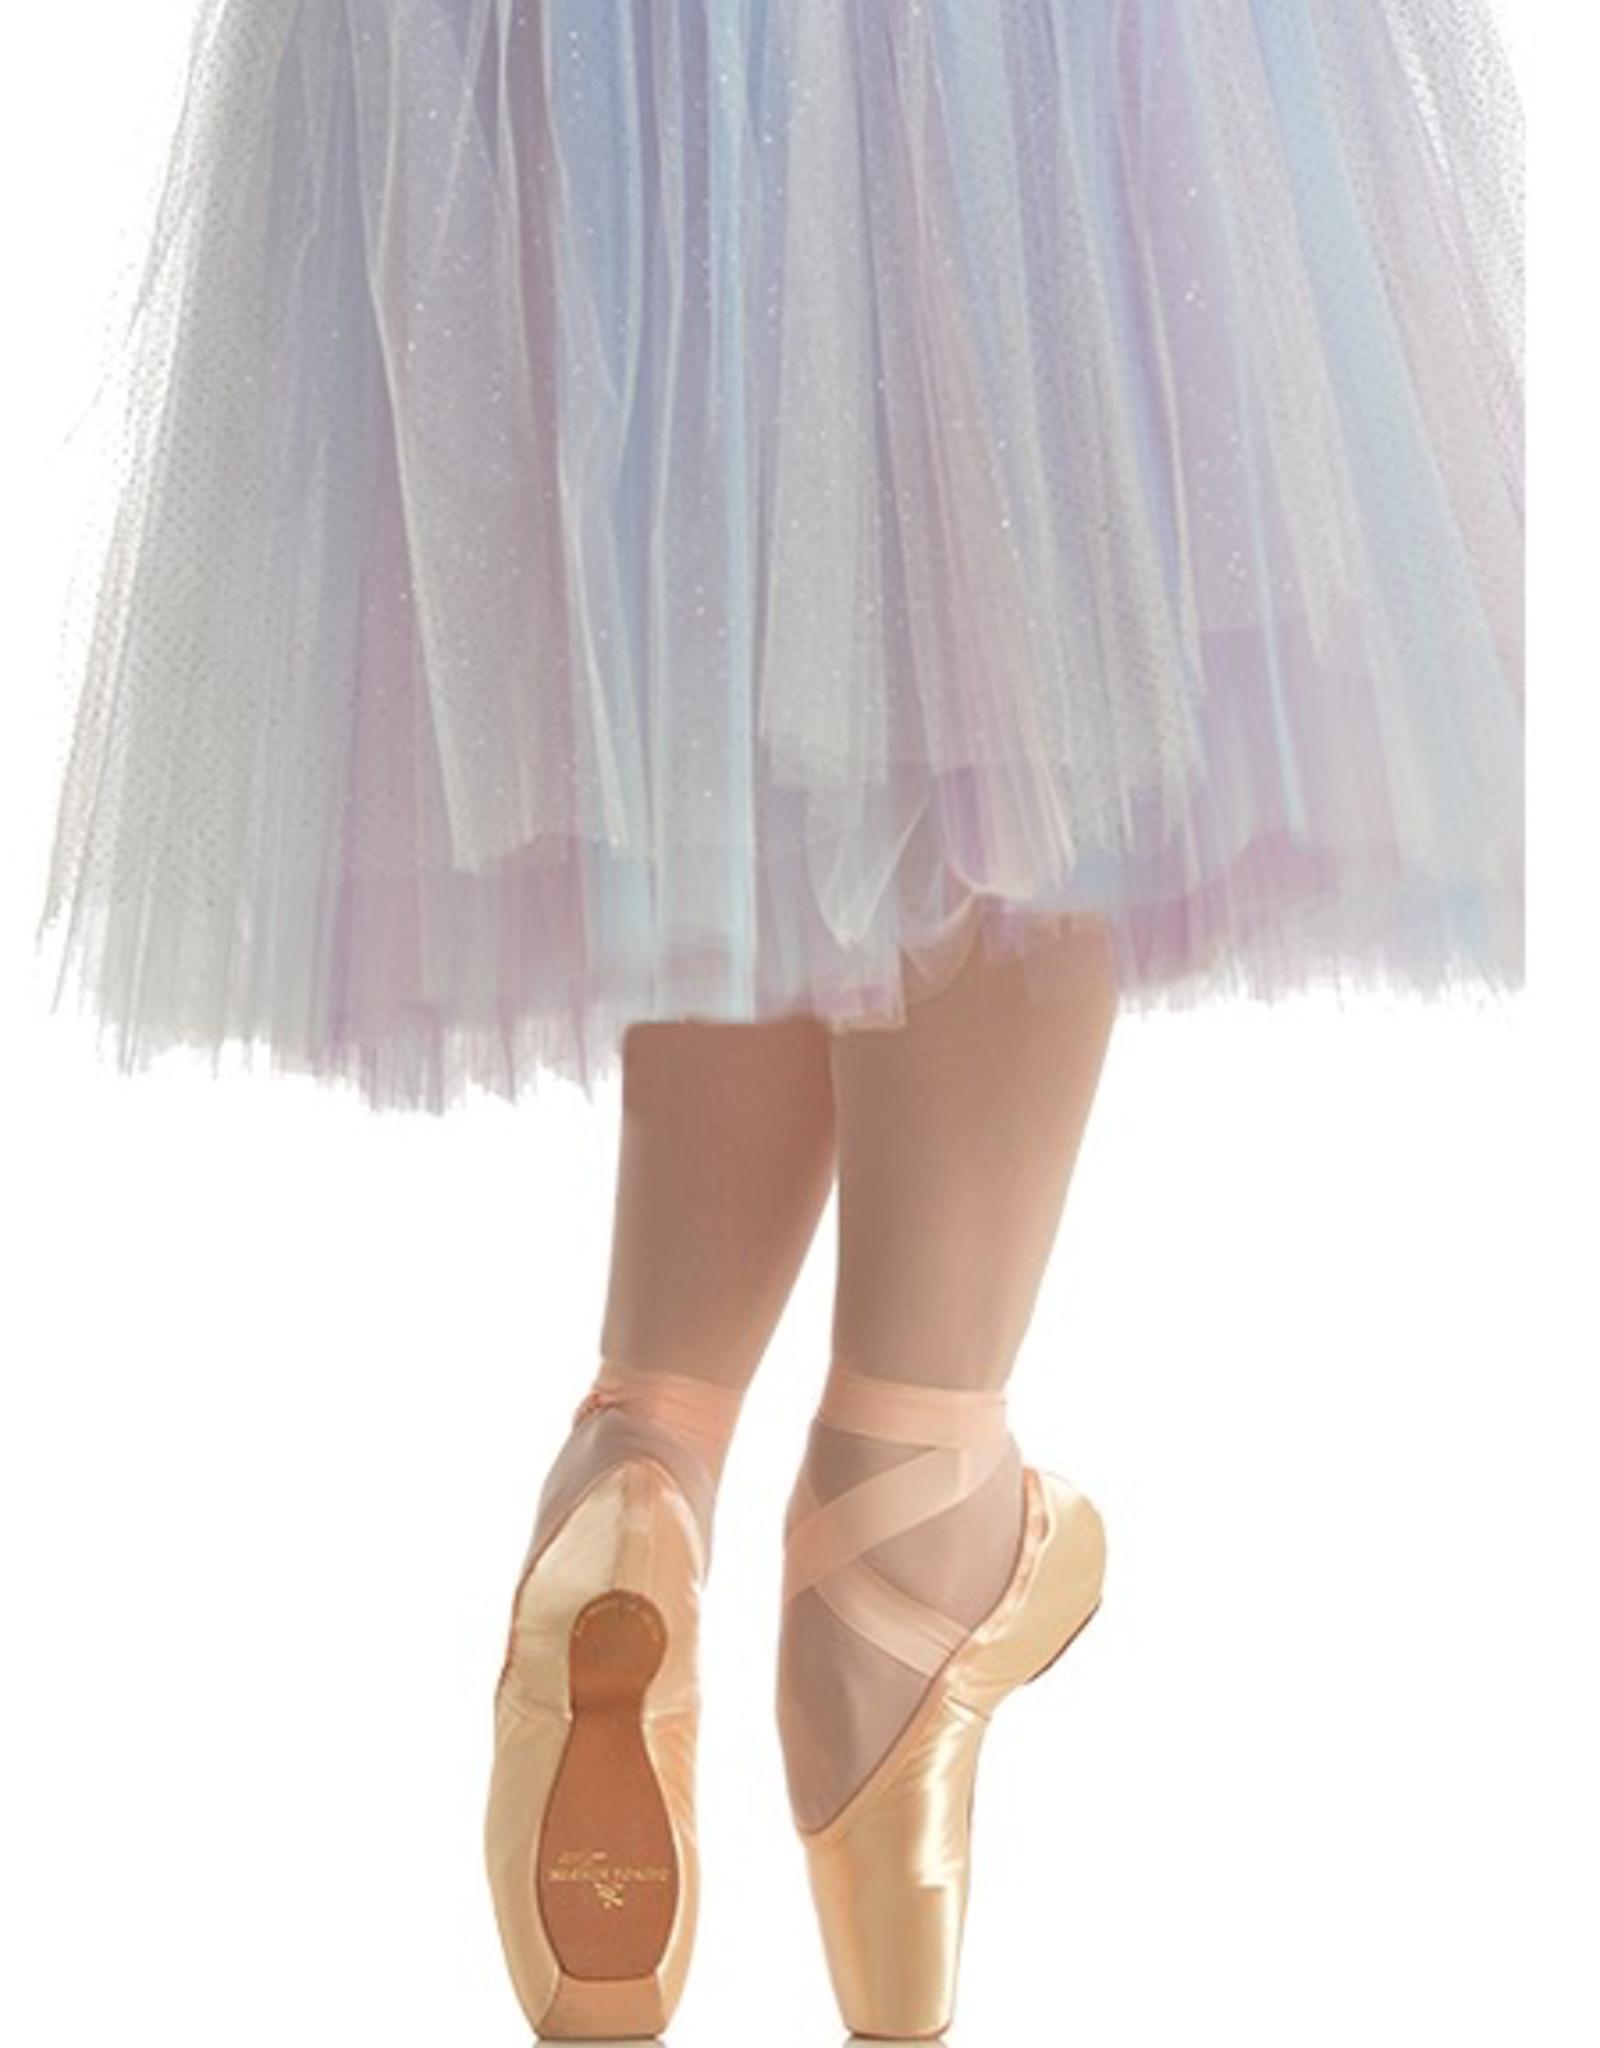 Gaynor Minden Sculpted Fit/Low Heel Pointe Shoe